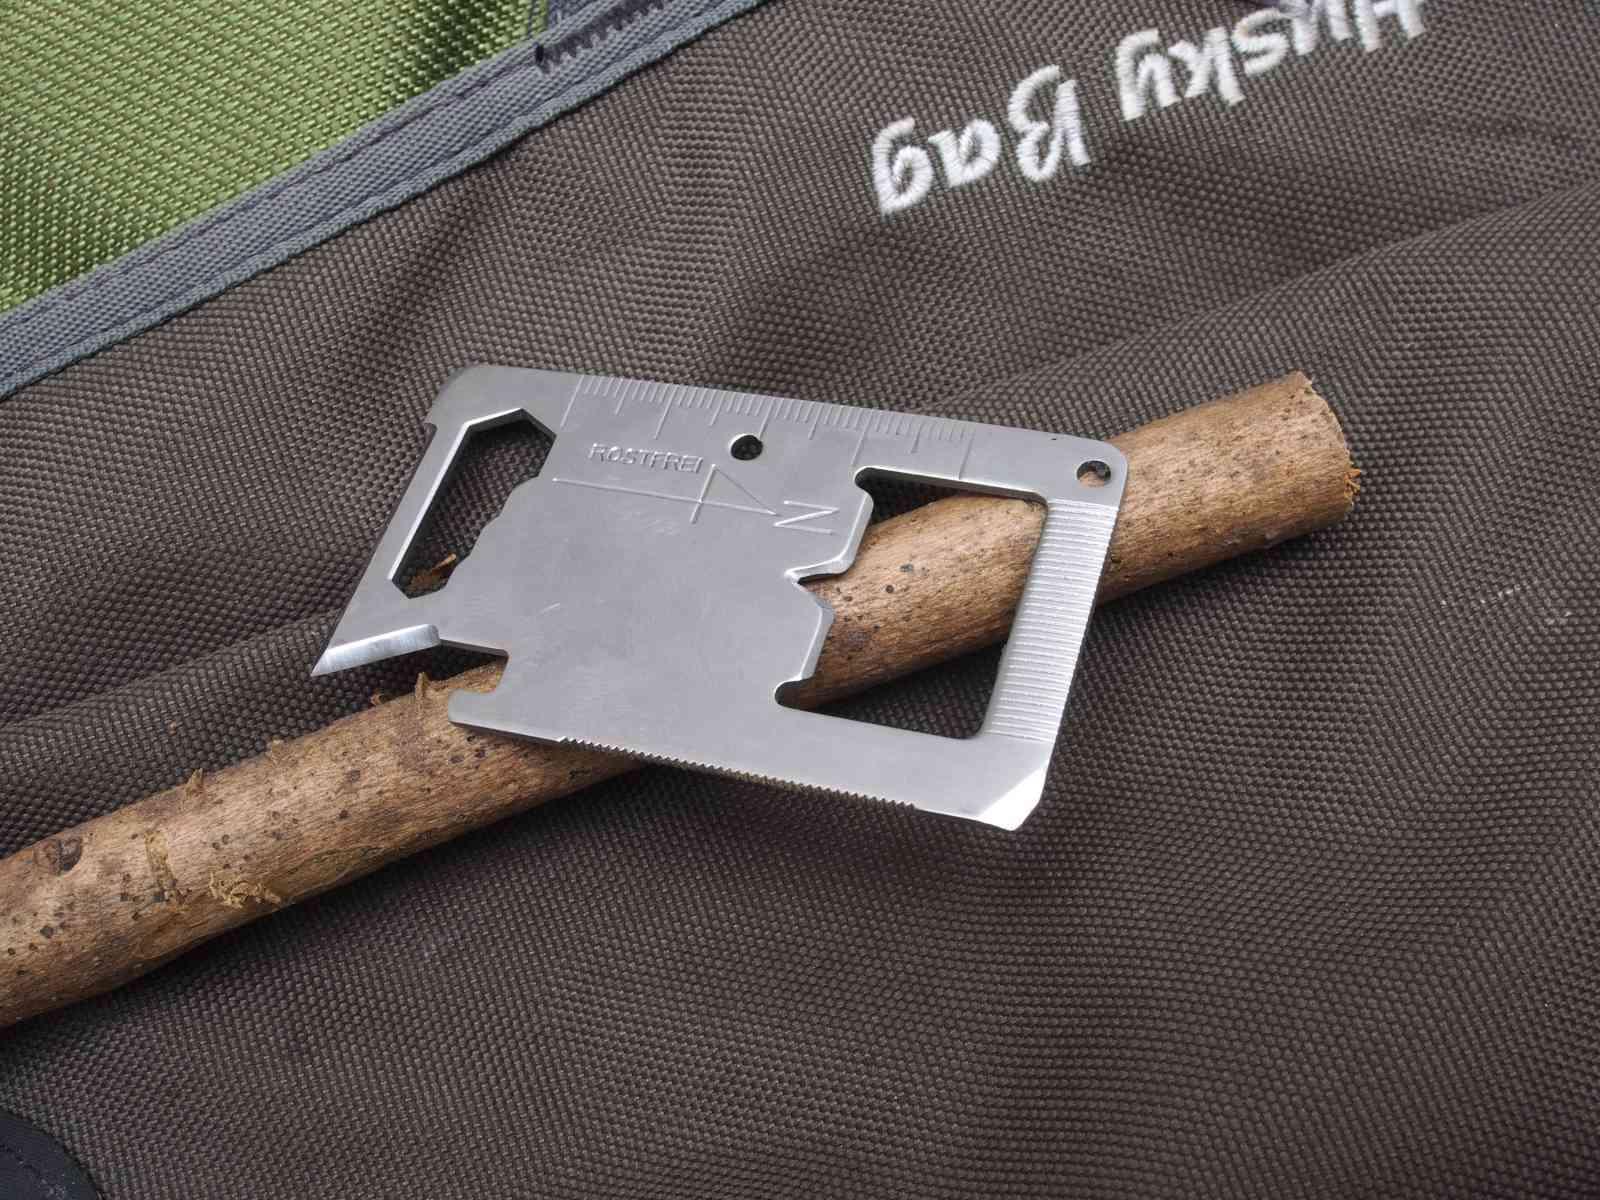 Mein Survival-Kit - Herbertz Campingtool